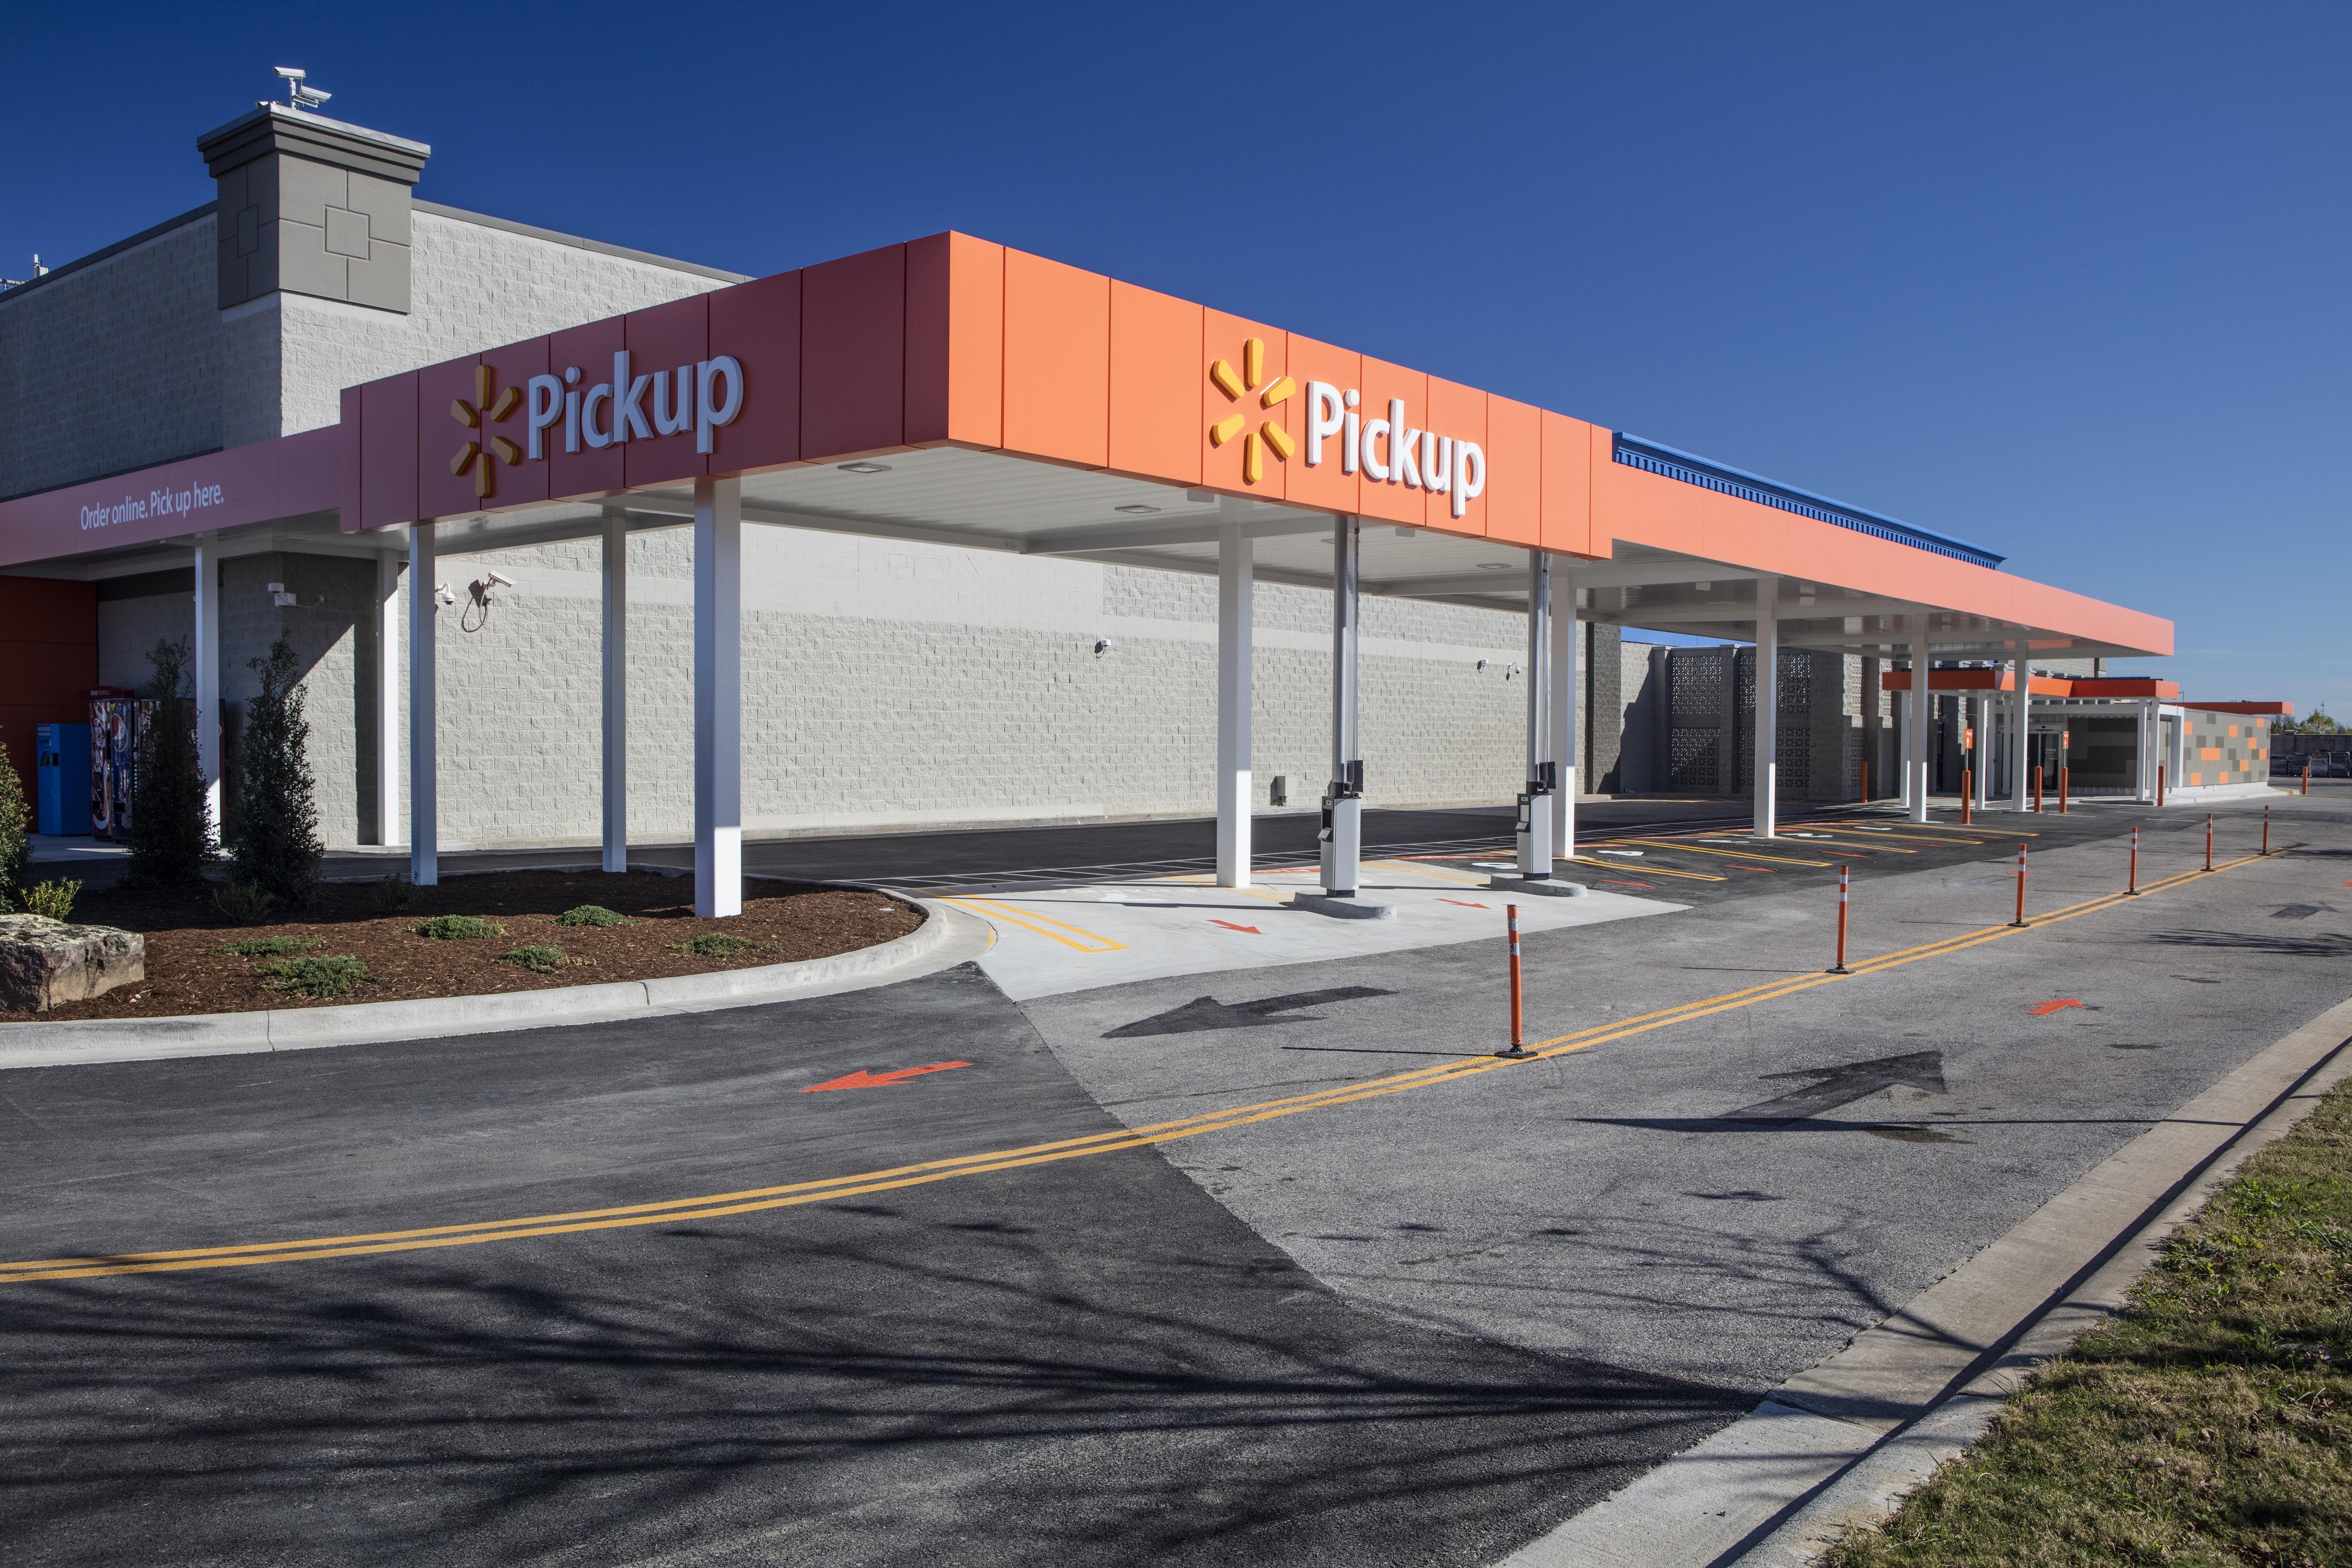 The pickup area at a Wal-Mart supercenter.